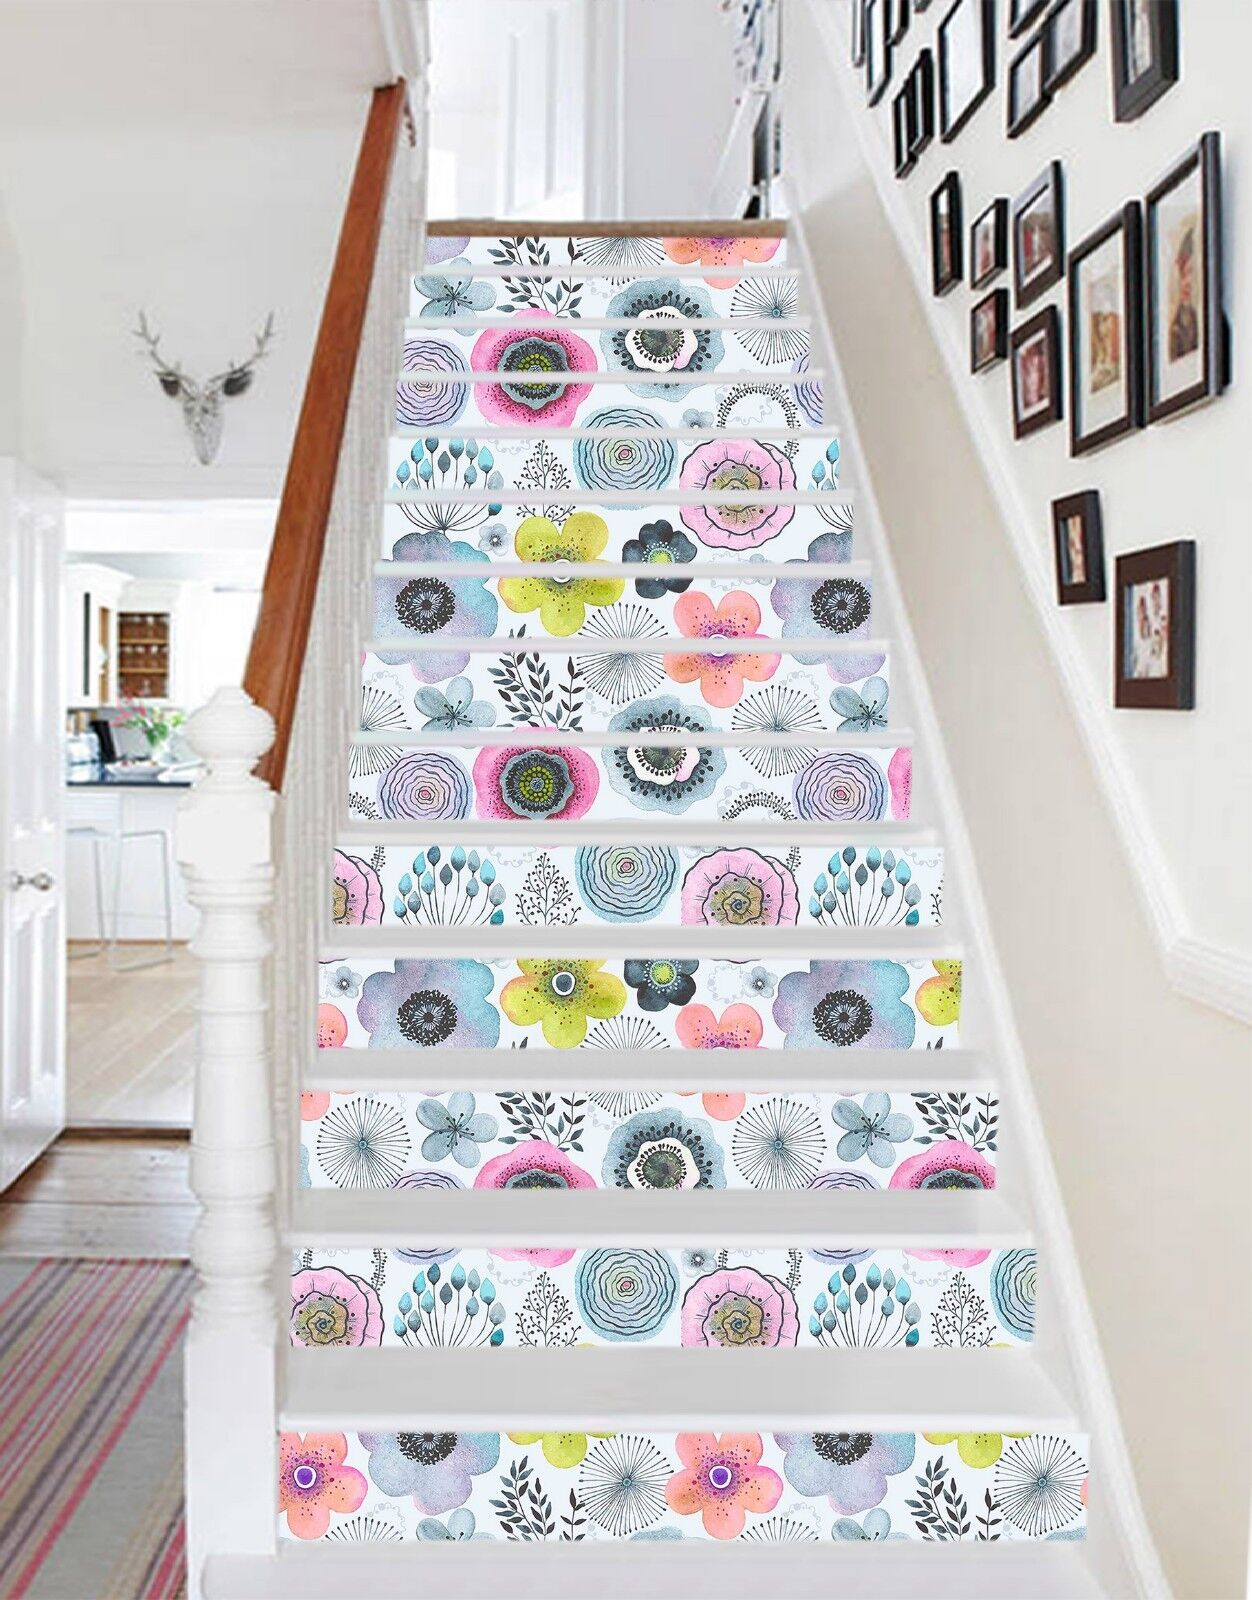 3D Cartoon Petals Stair Risers Decoration Photo Mural Vinyl Decal Wallpaper US